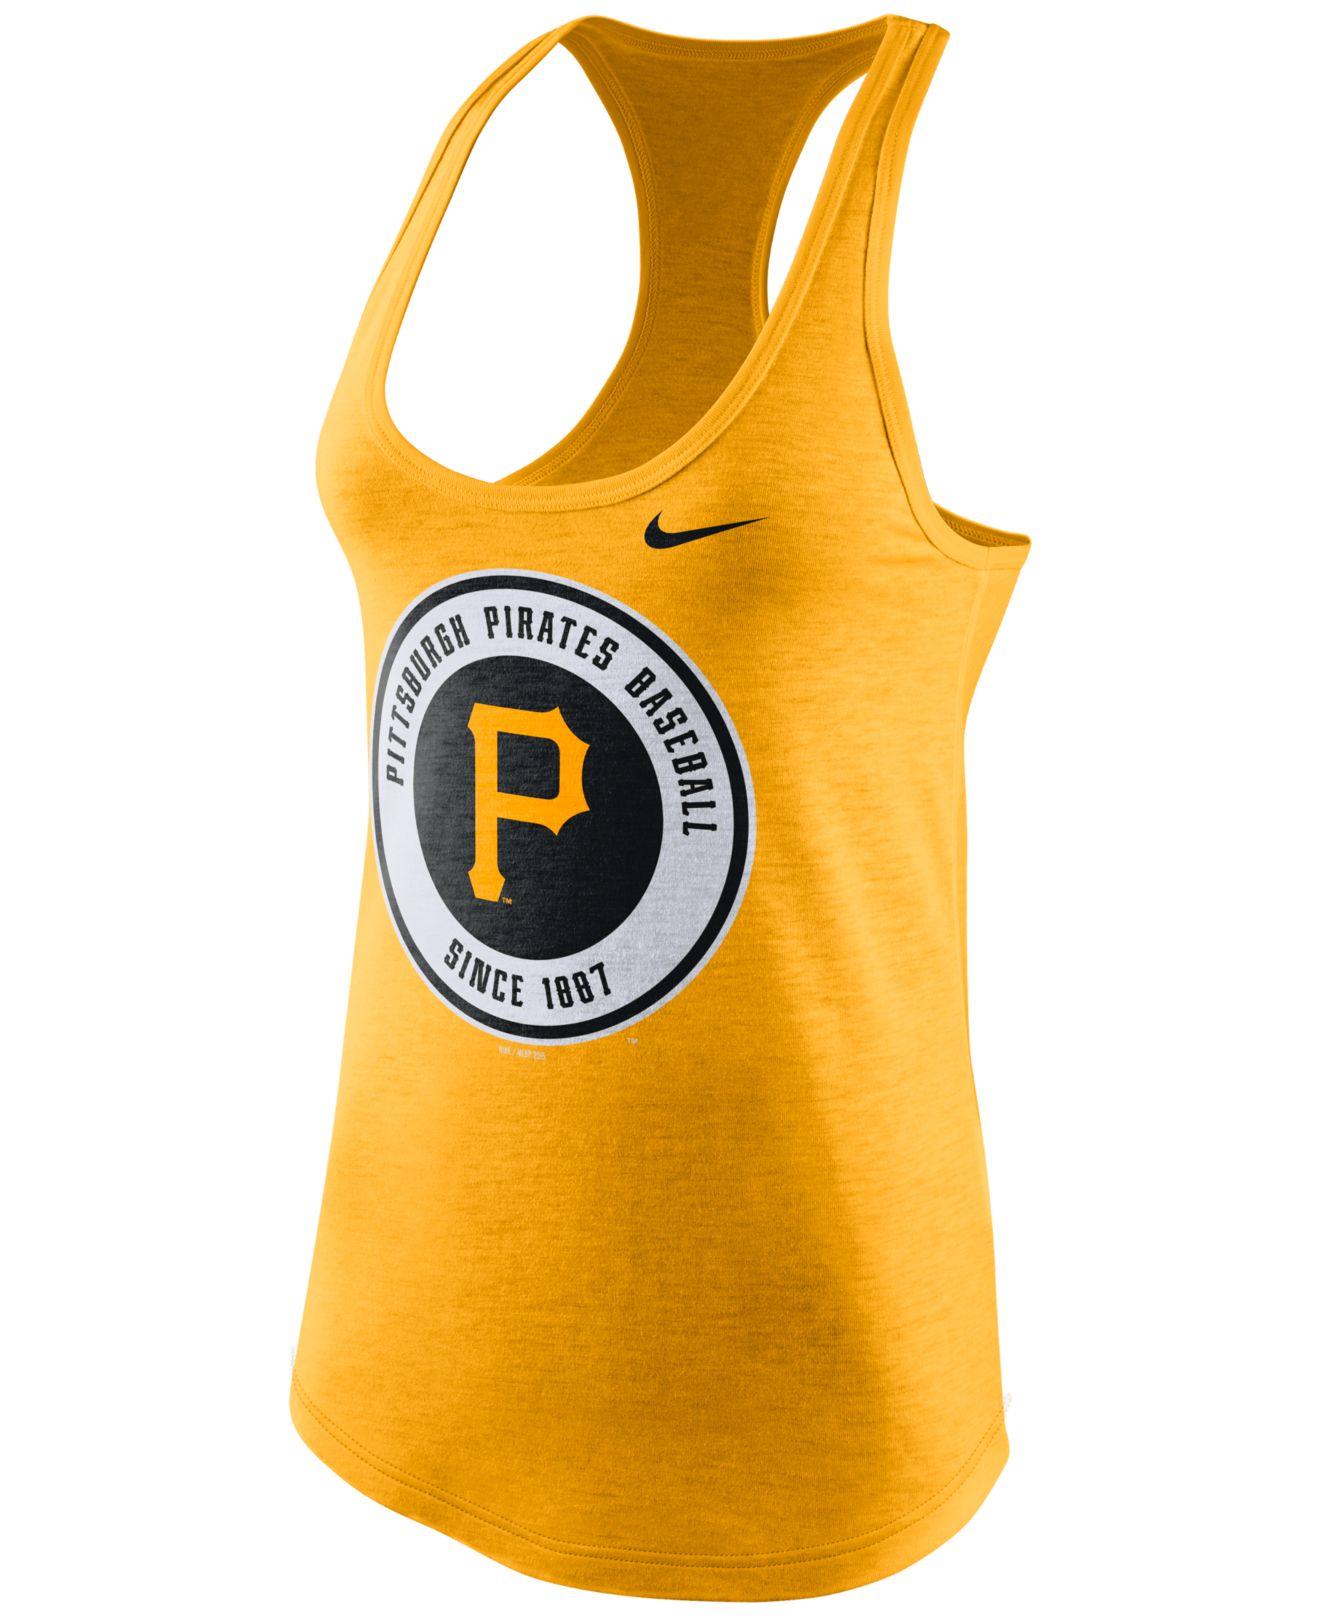 bec24258bdf Nike Women'S Pittsburgh Pirates Tri-Blend Tank Top in Yellow - Lyst